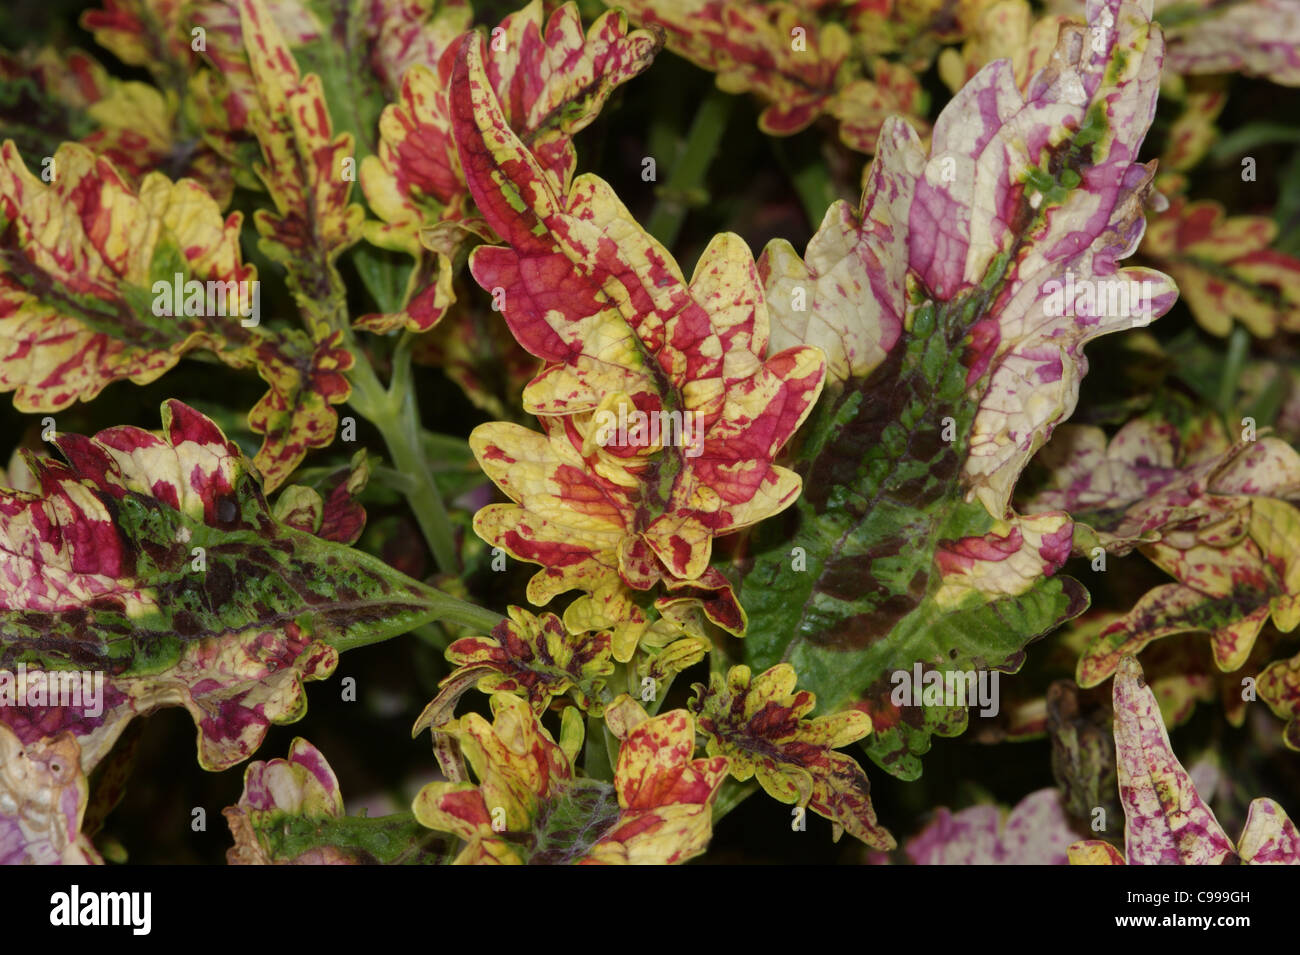 Paisley Shawl Stock Photos & Paisley Shawl Stock Images